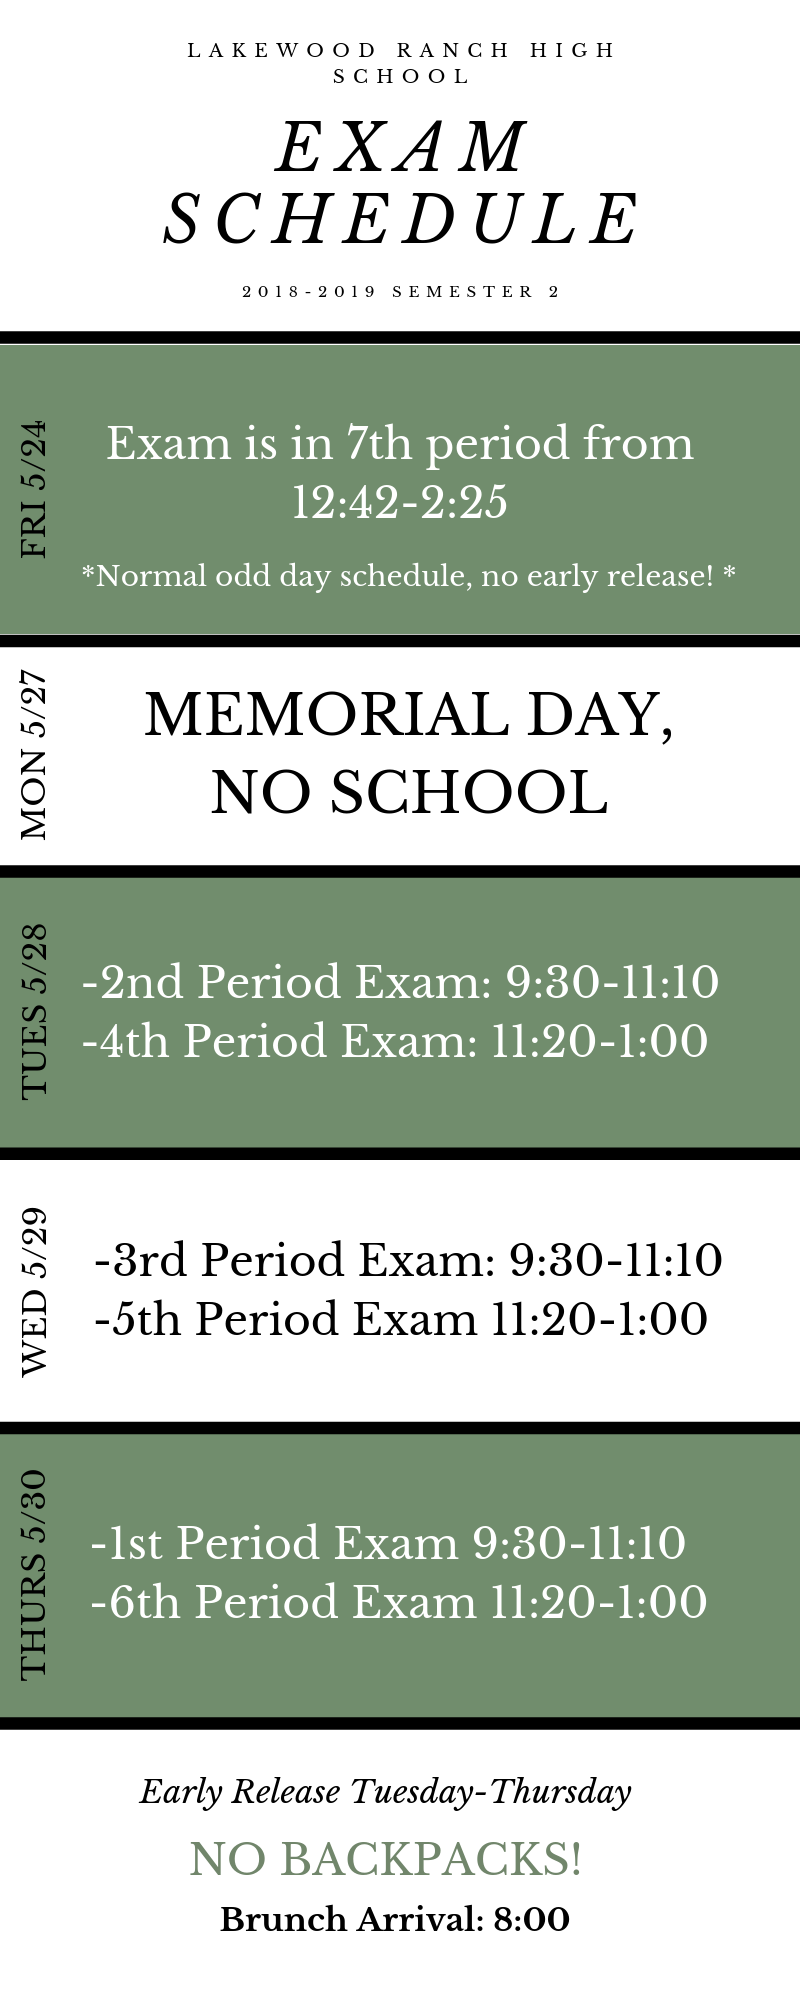 exam schedule infographic 2019